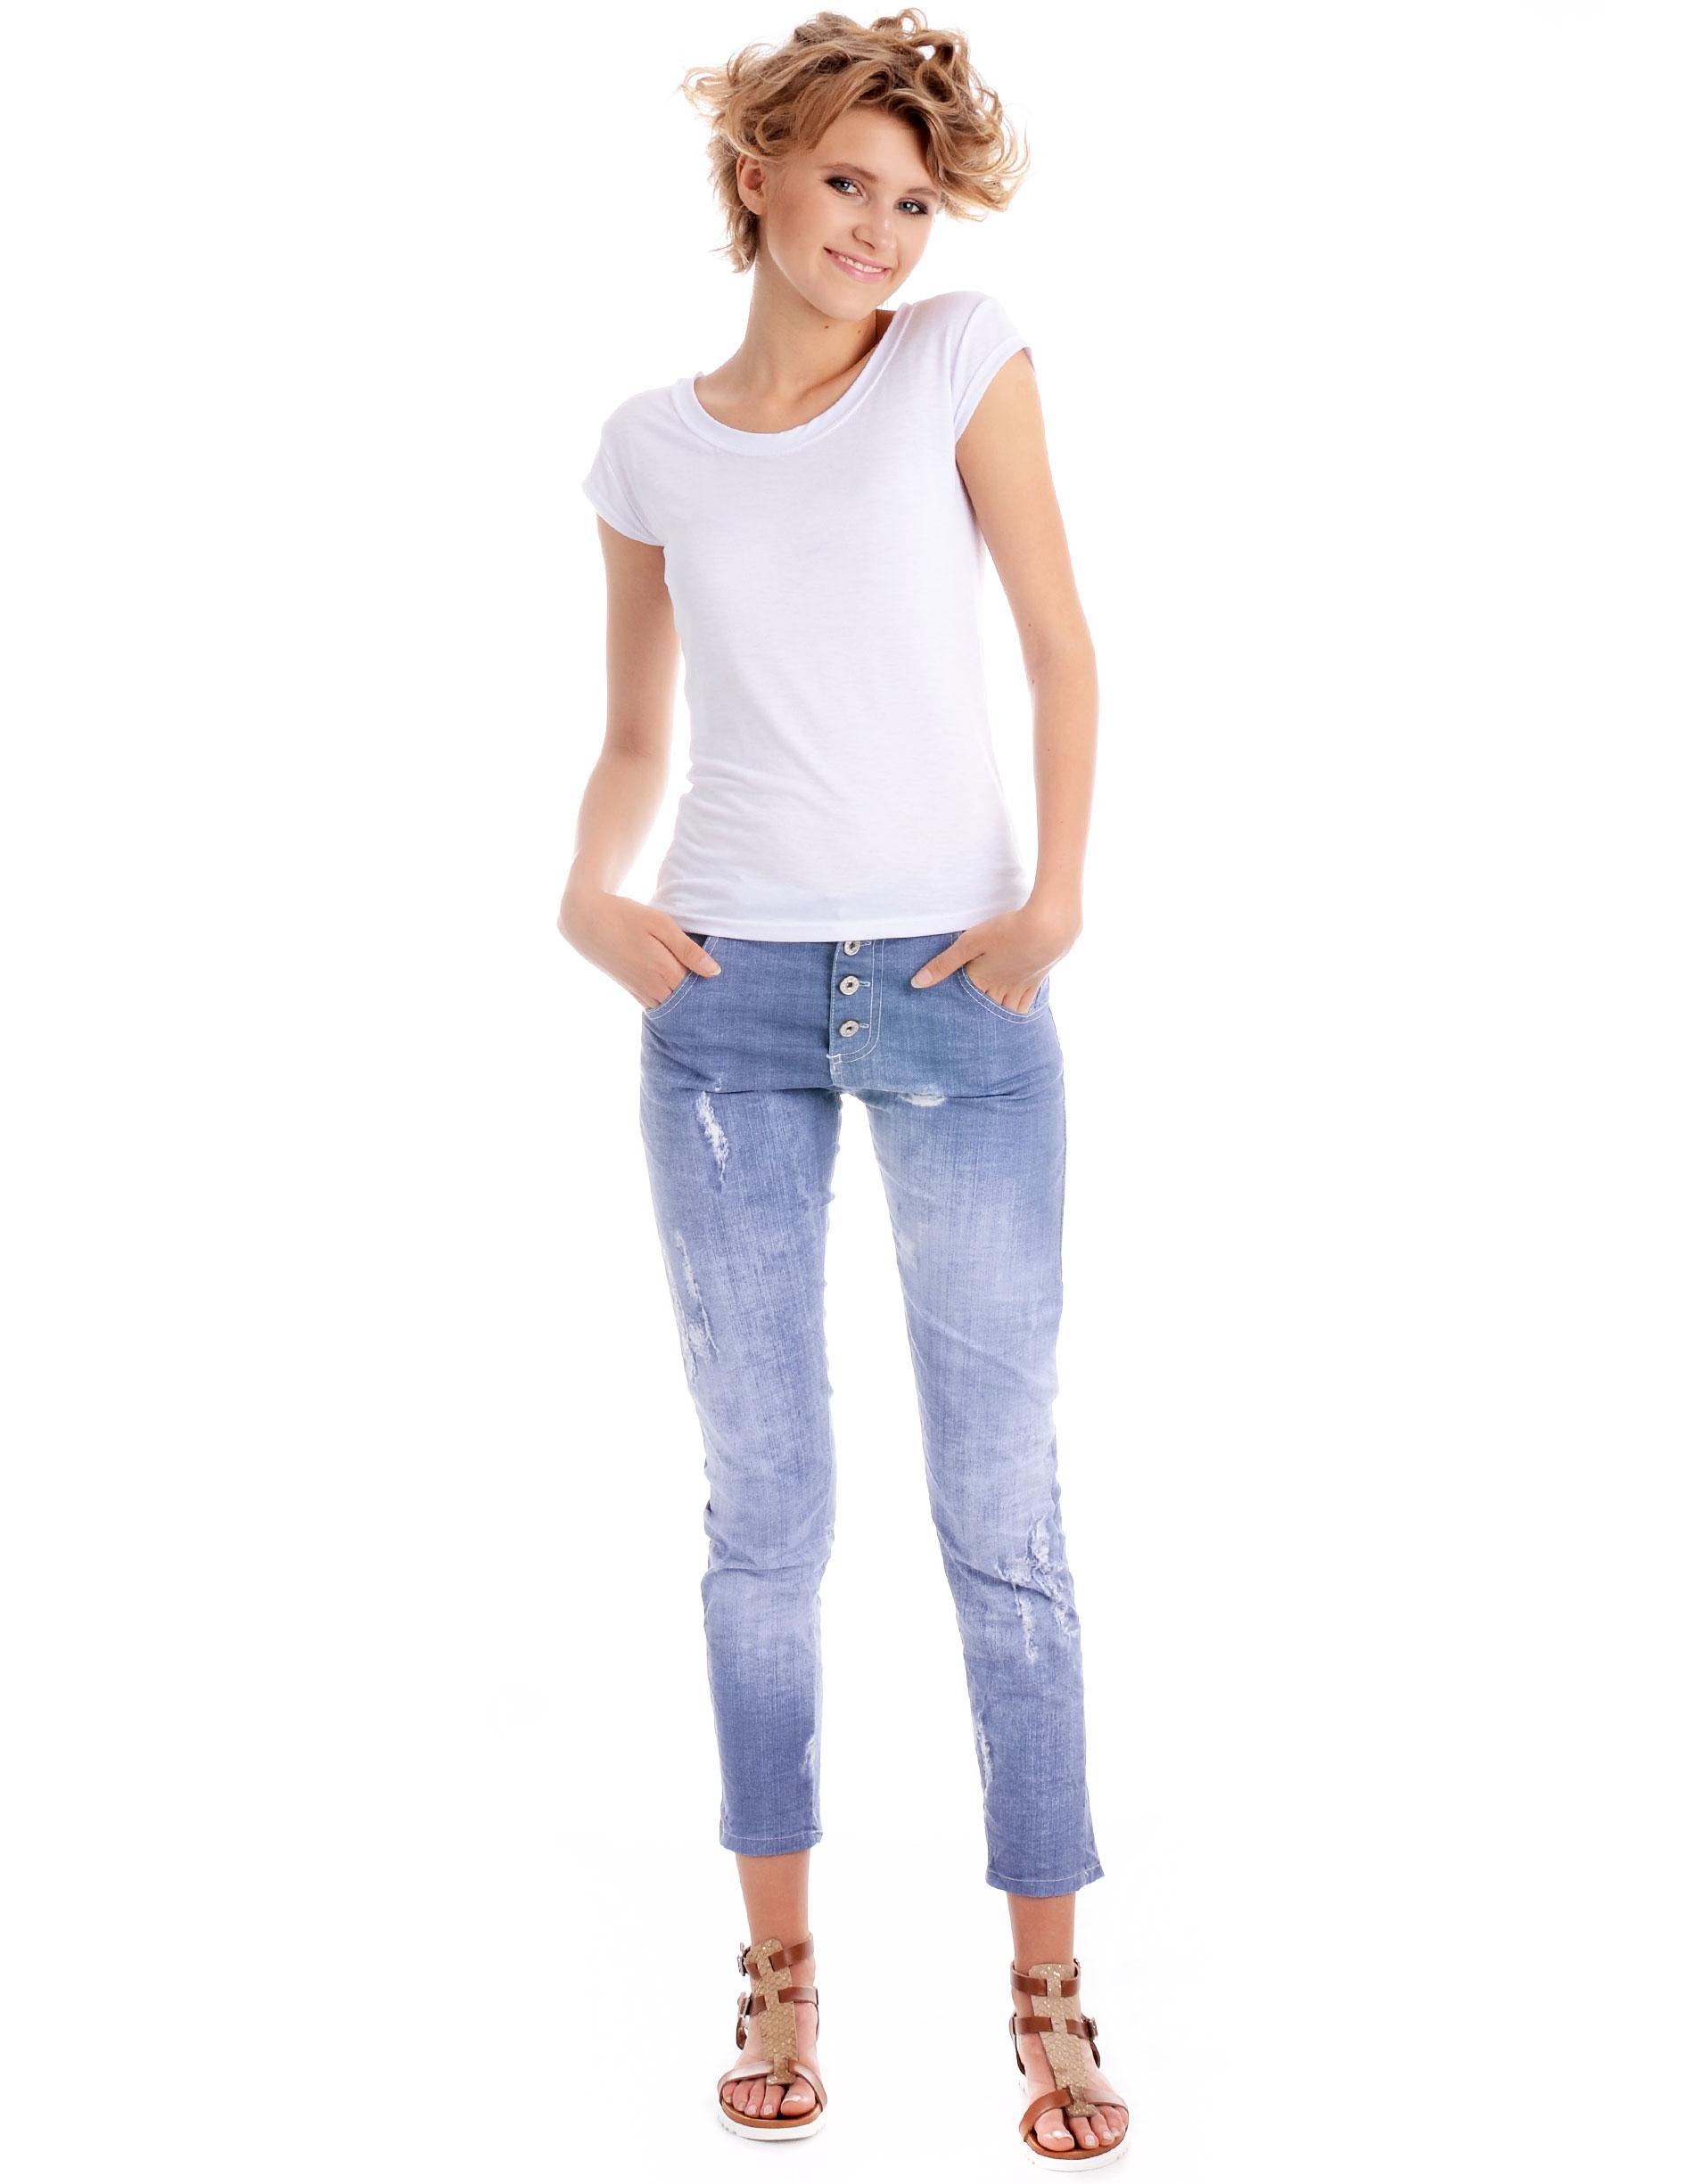 Spodnie - 146-168122 JE - Unisono